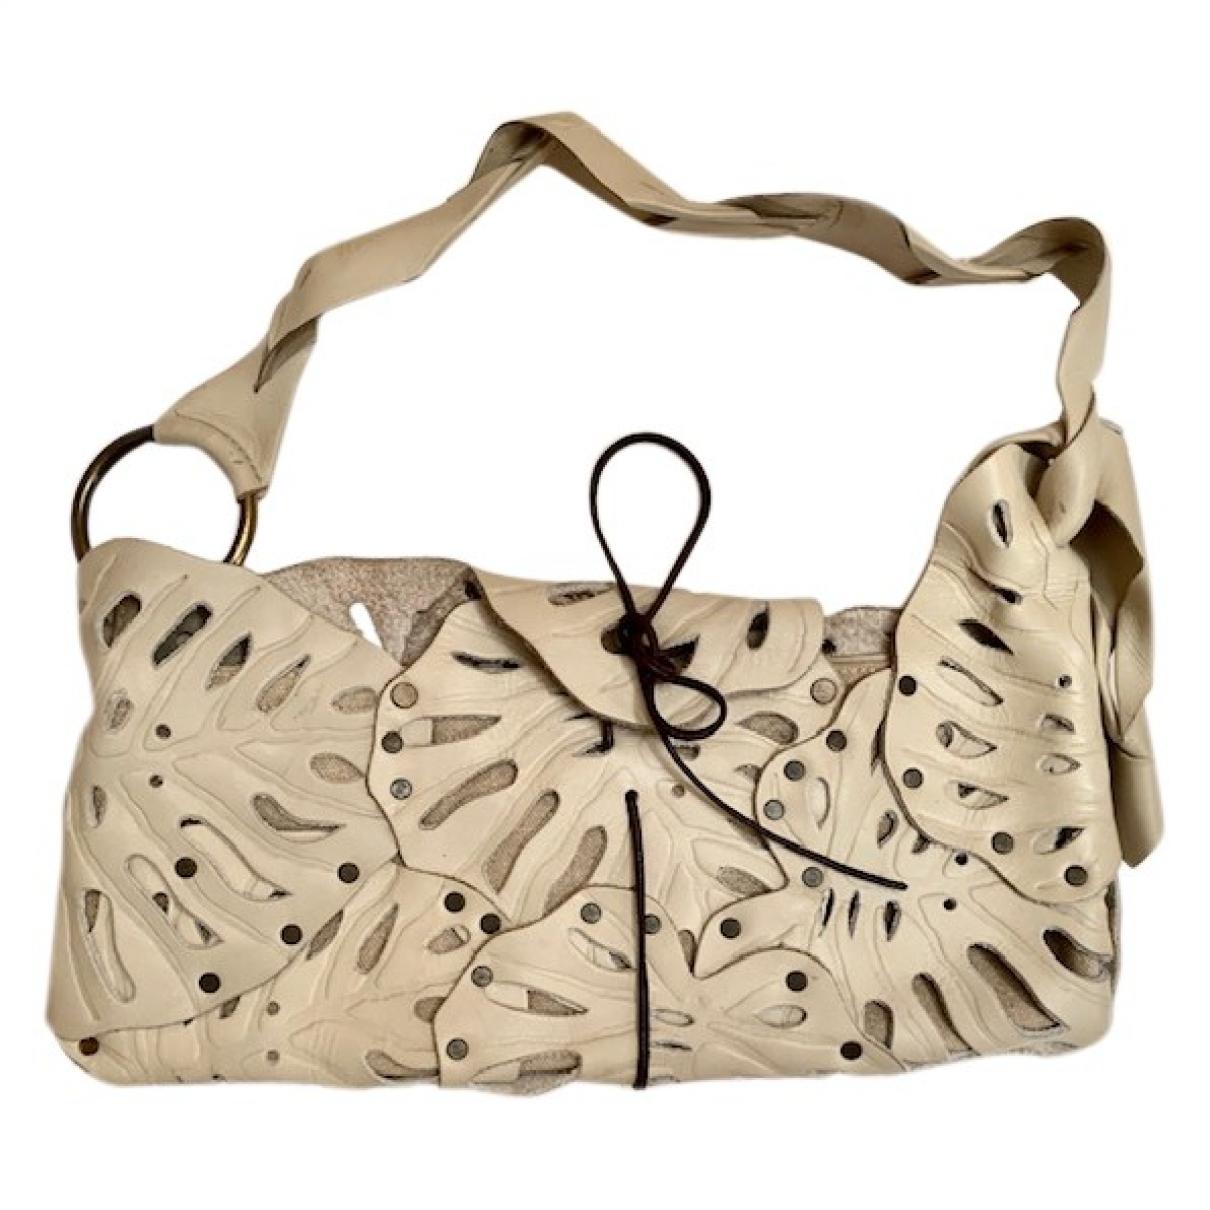 Jamin Puech \N Ecru Leather Clutch bag for Women \N